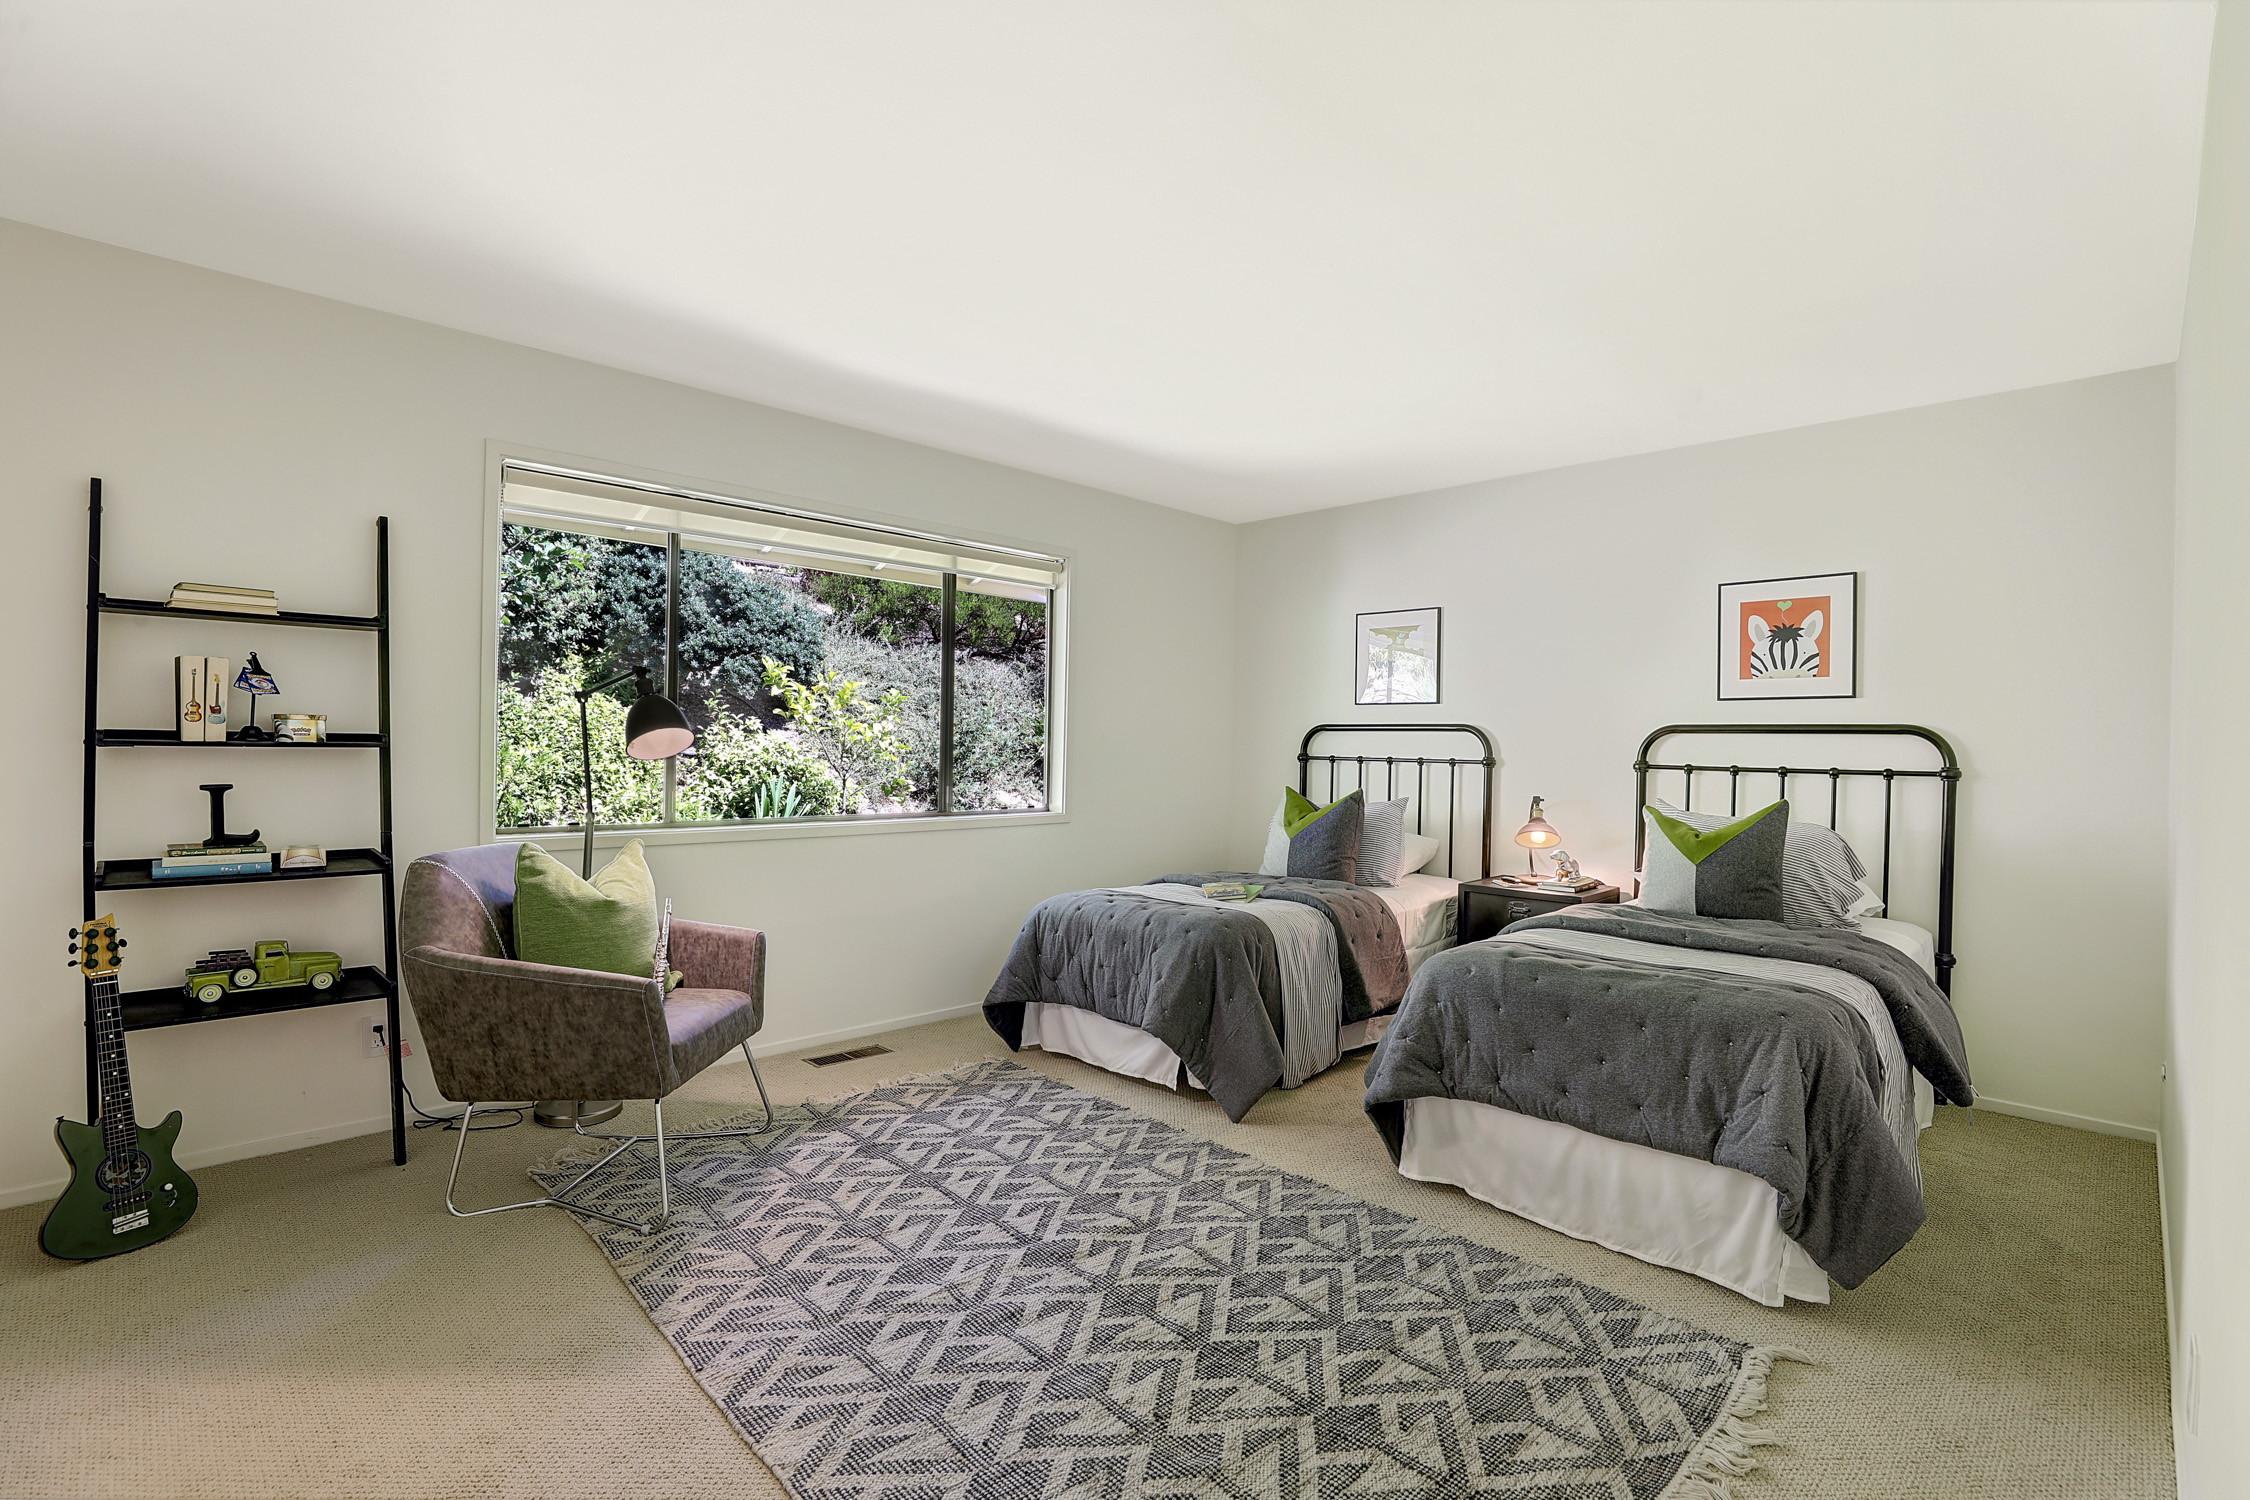 16Dorian 45 MLSSan Rafael Real Estate - Listed by Julia Fitzpatrick + Allie Fornesi Team Own Marin County .jpg